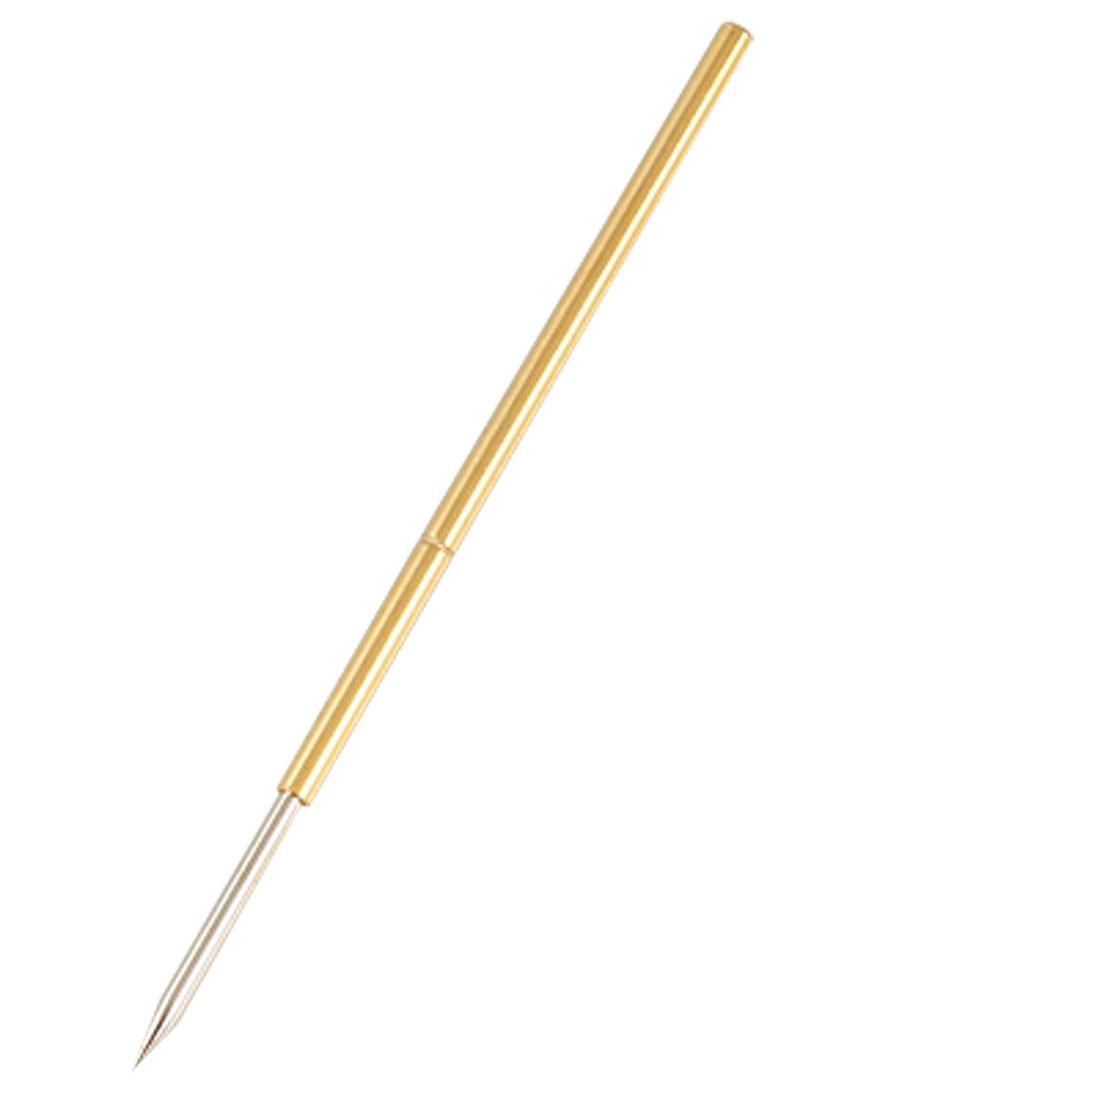 P111-B Gold Tone Spear Tip Spring Test Probes Pins 100 Pcs